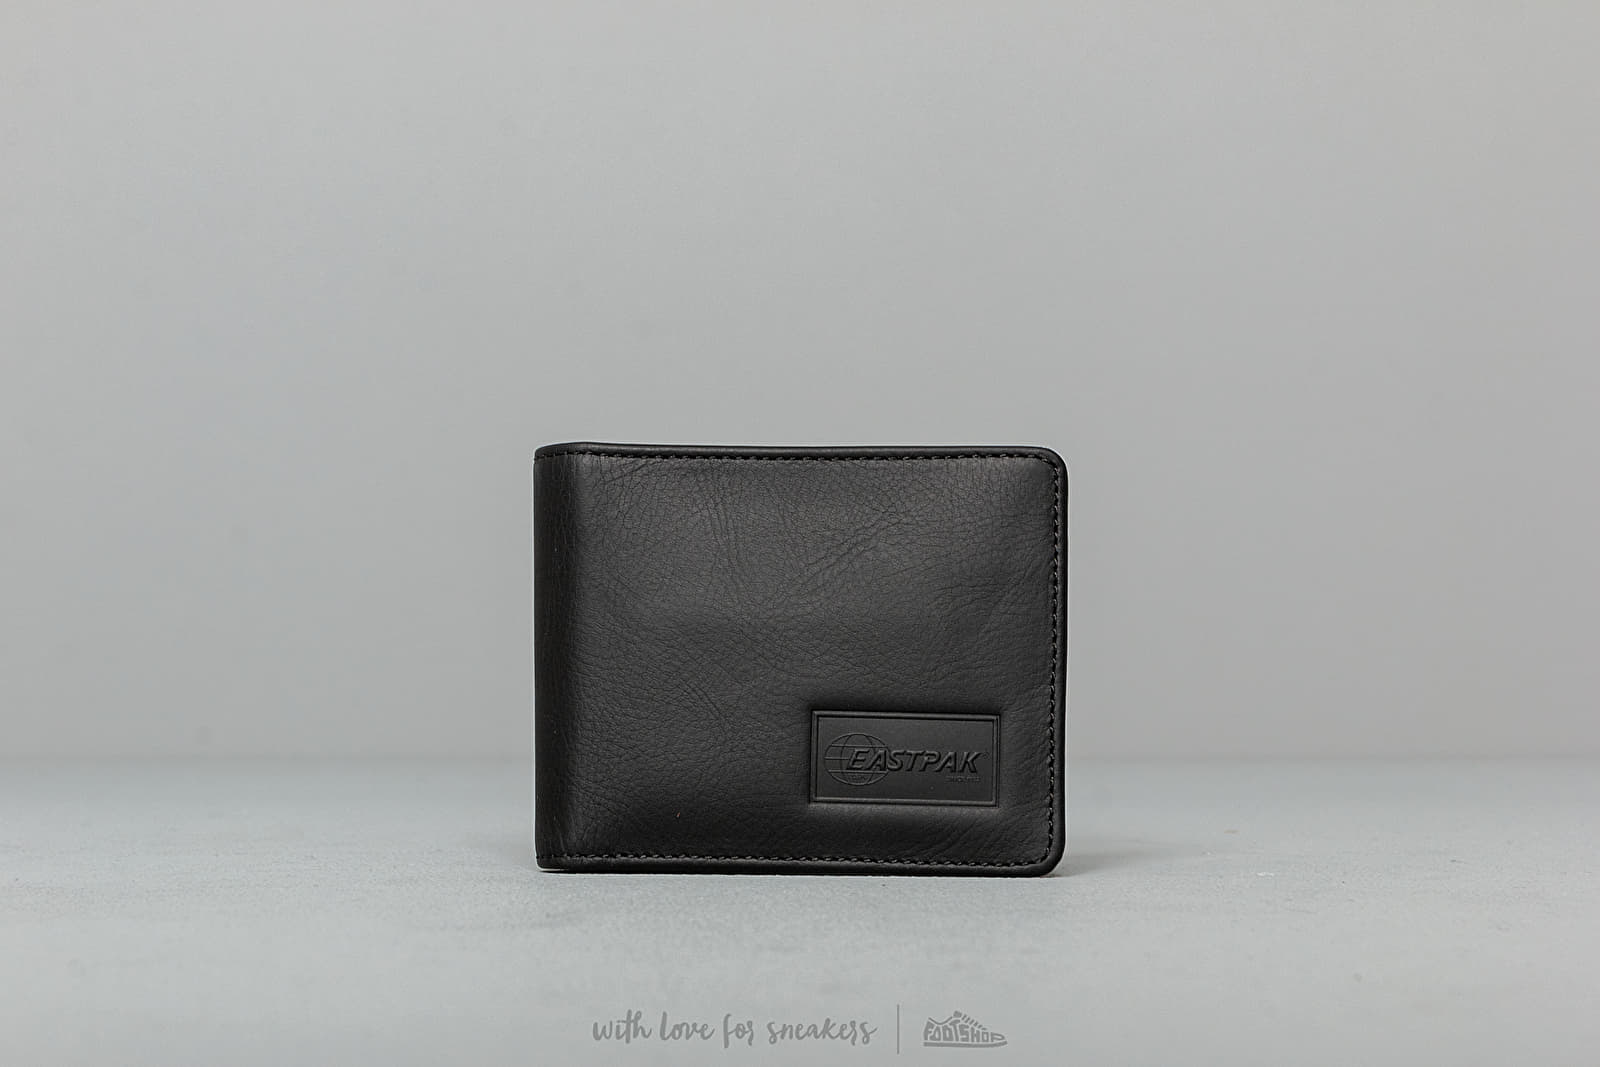 EASTPAK Drew RFID Wallet Black Ink Leather za skvelú cenu 55 € kúpite na Footshop.sk